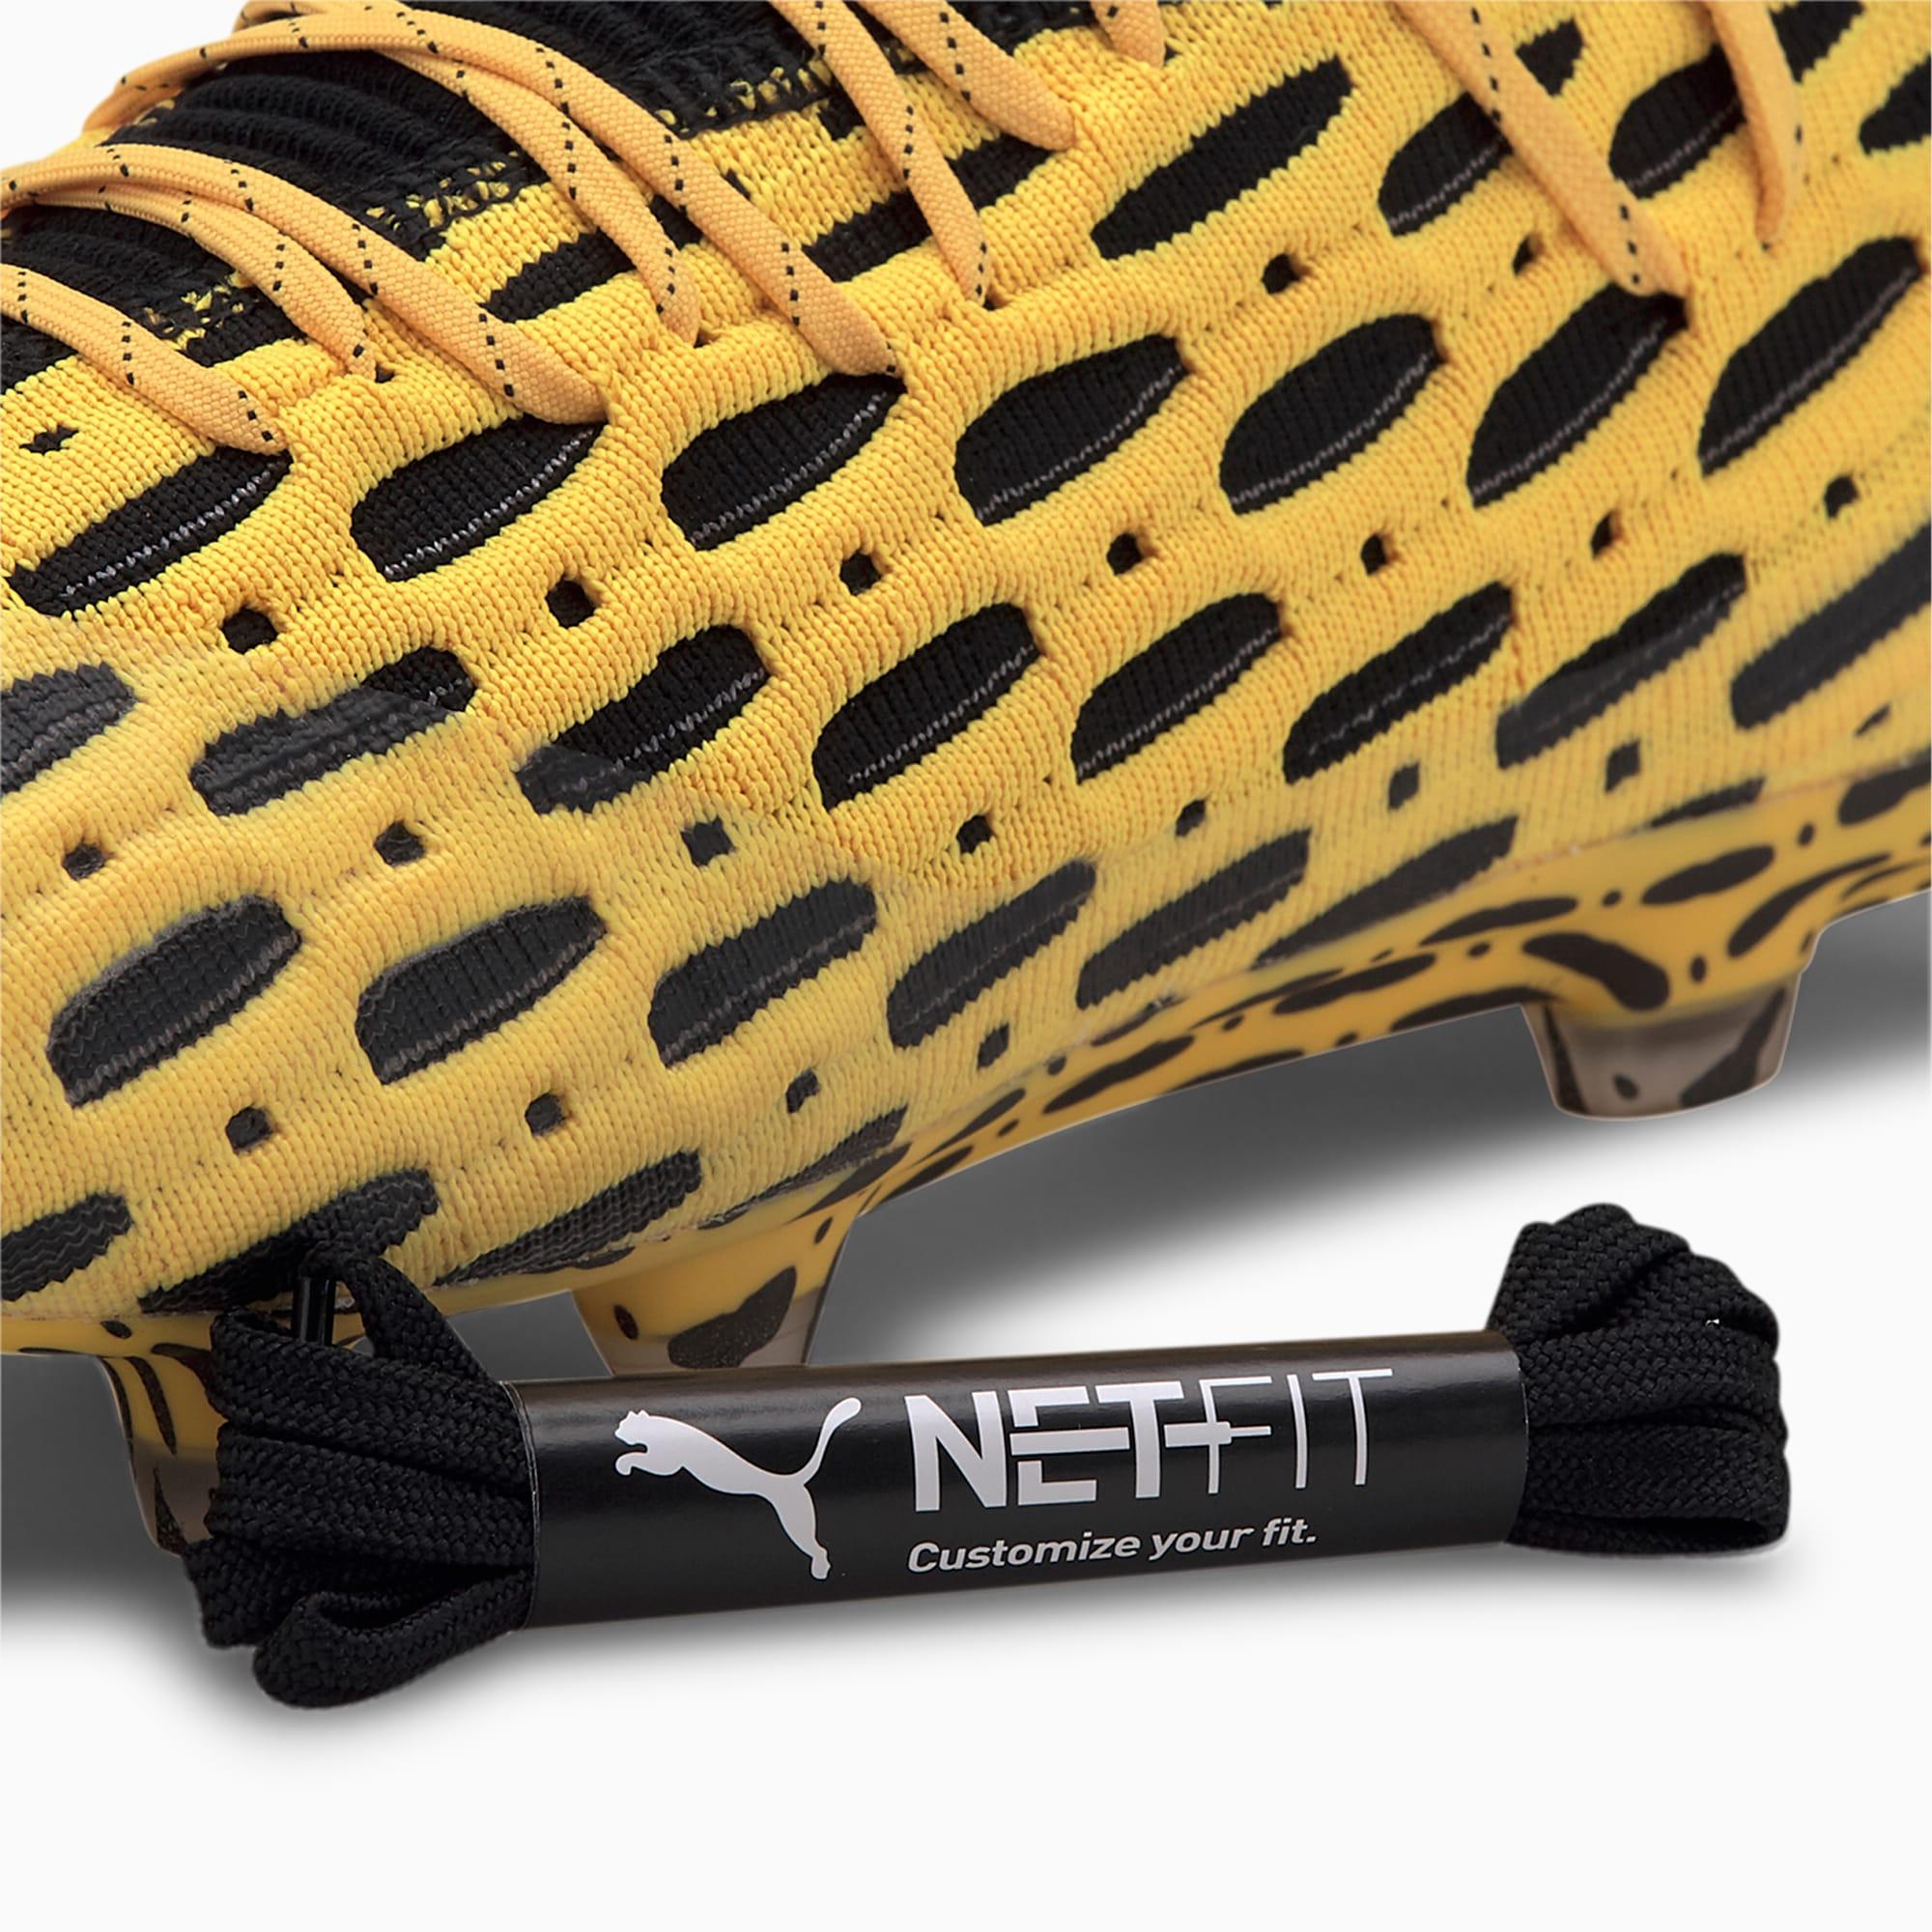 Scarpe da calcio FUTURE 5.1 NETFIT Low FGAG uomo